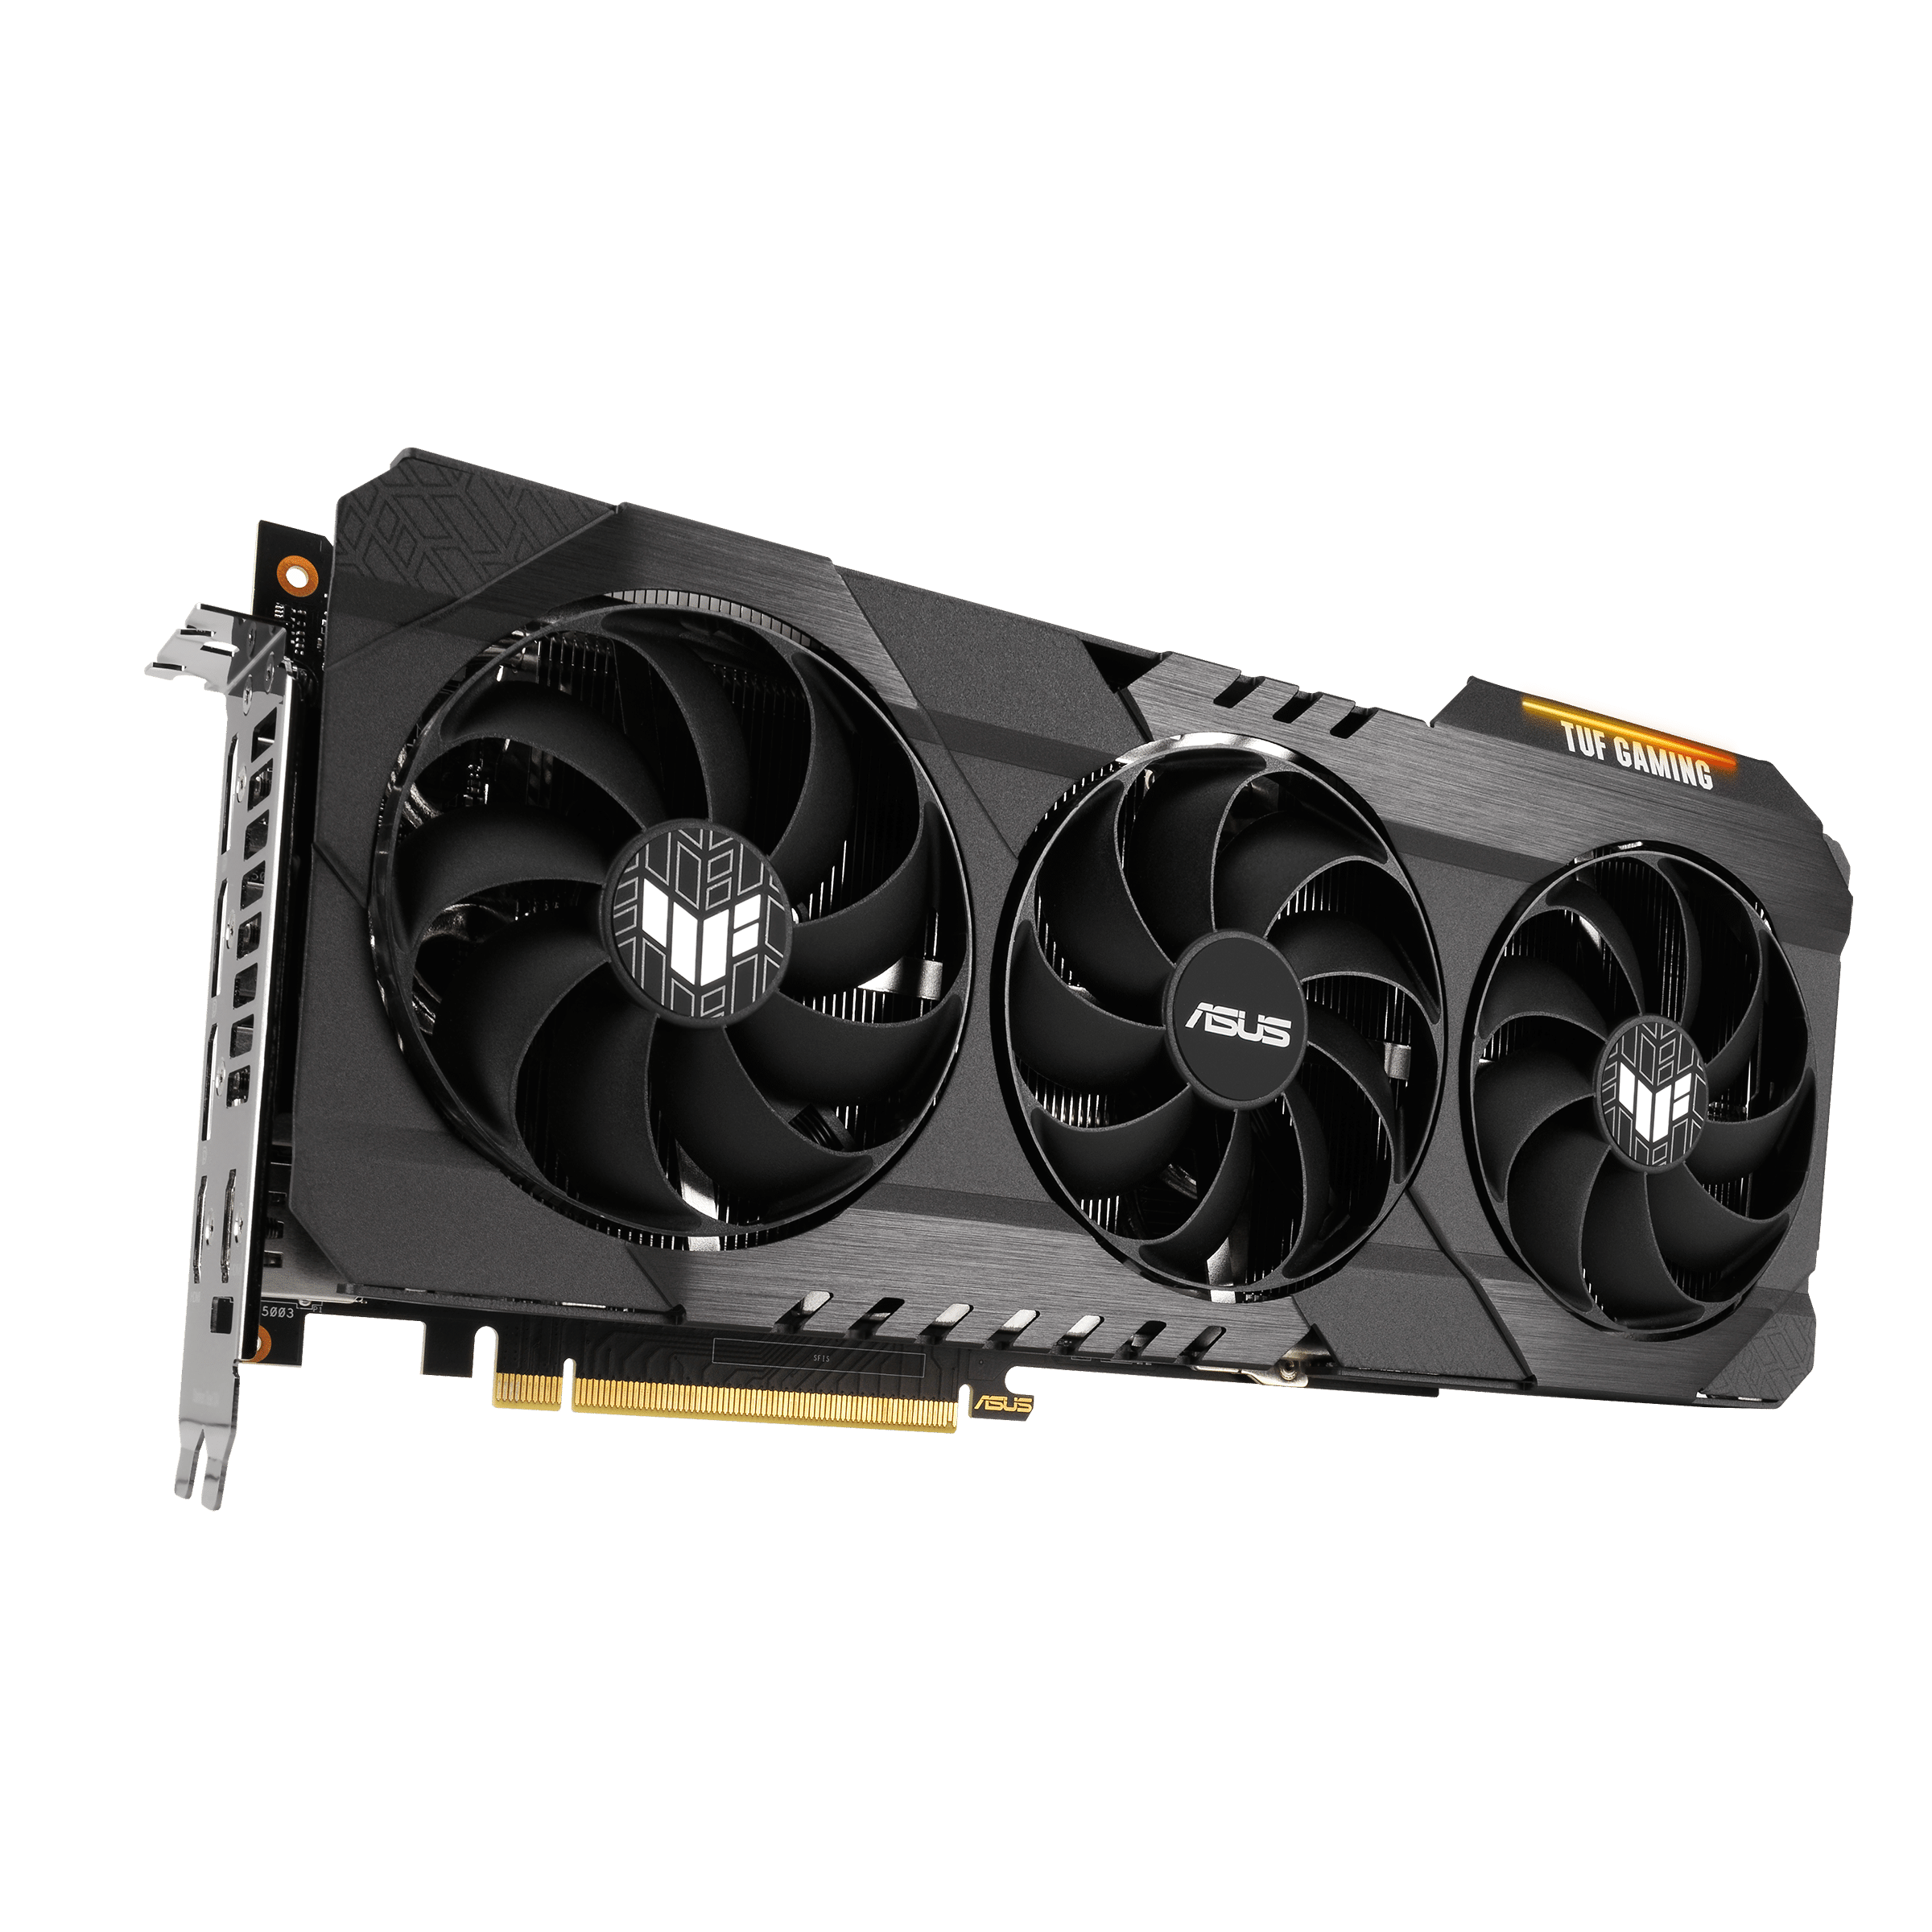 ASUS TUF GAMING GeForce RTX 3070 Ti OC Vertical View